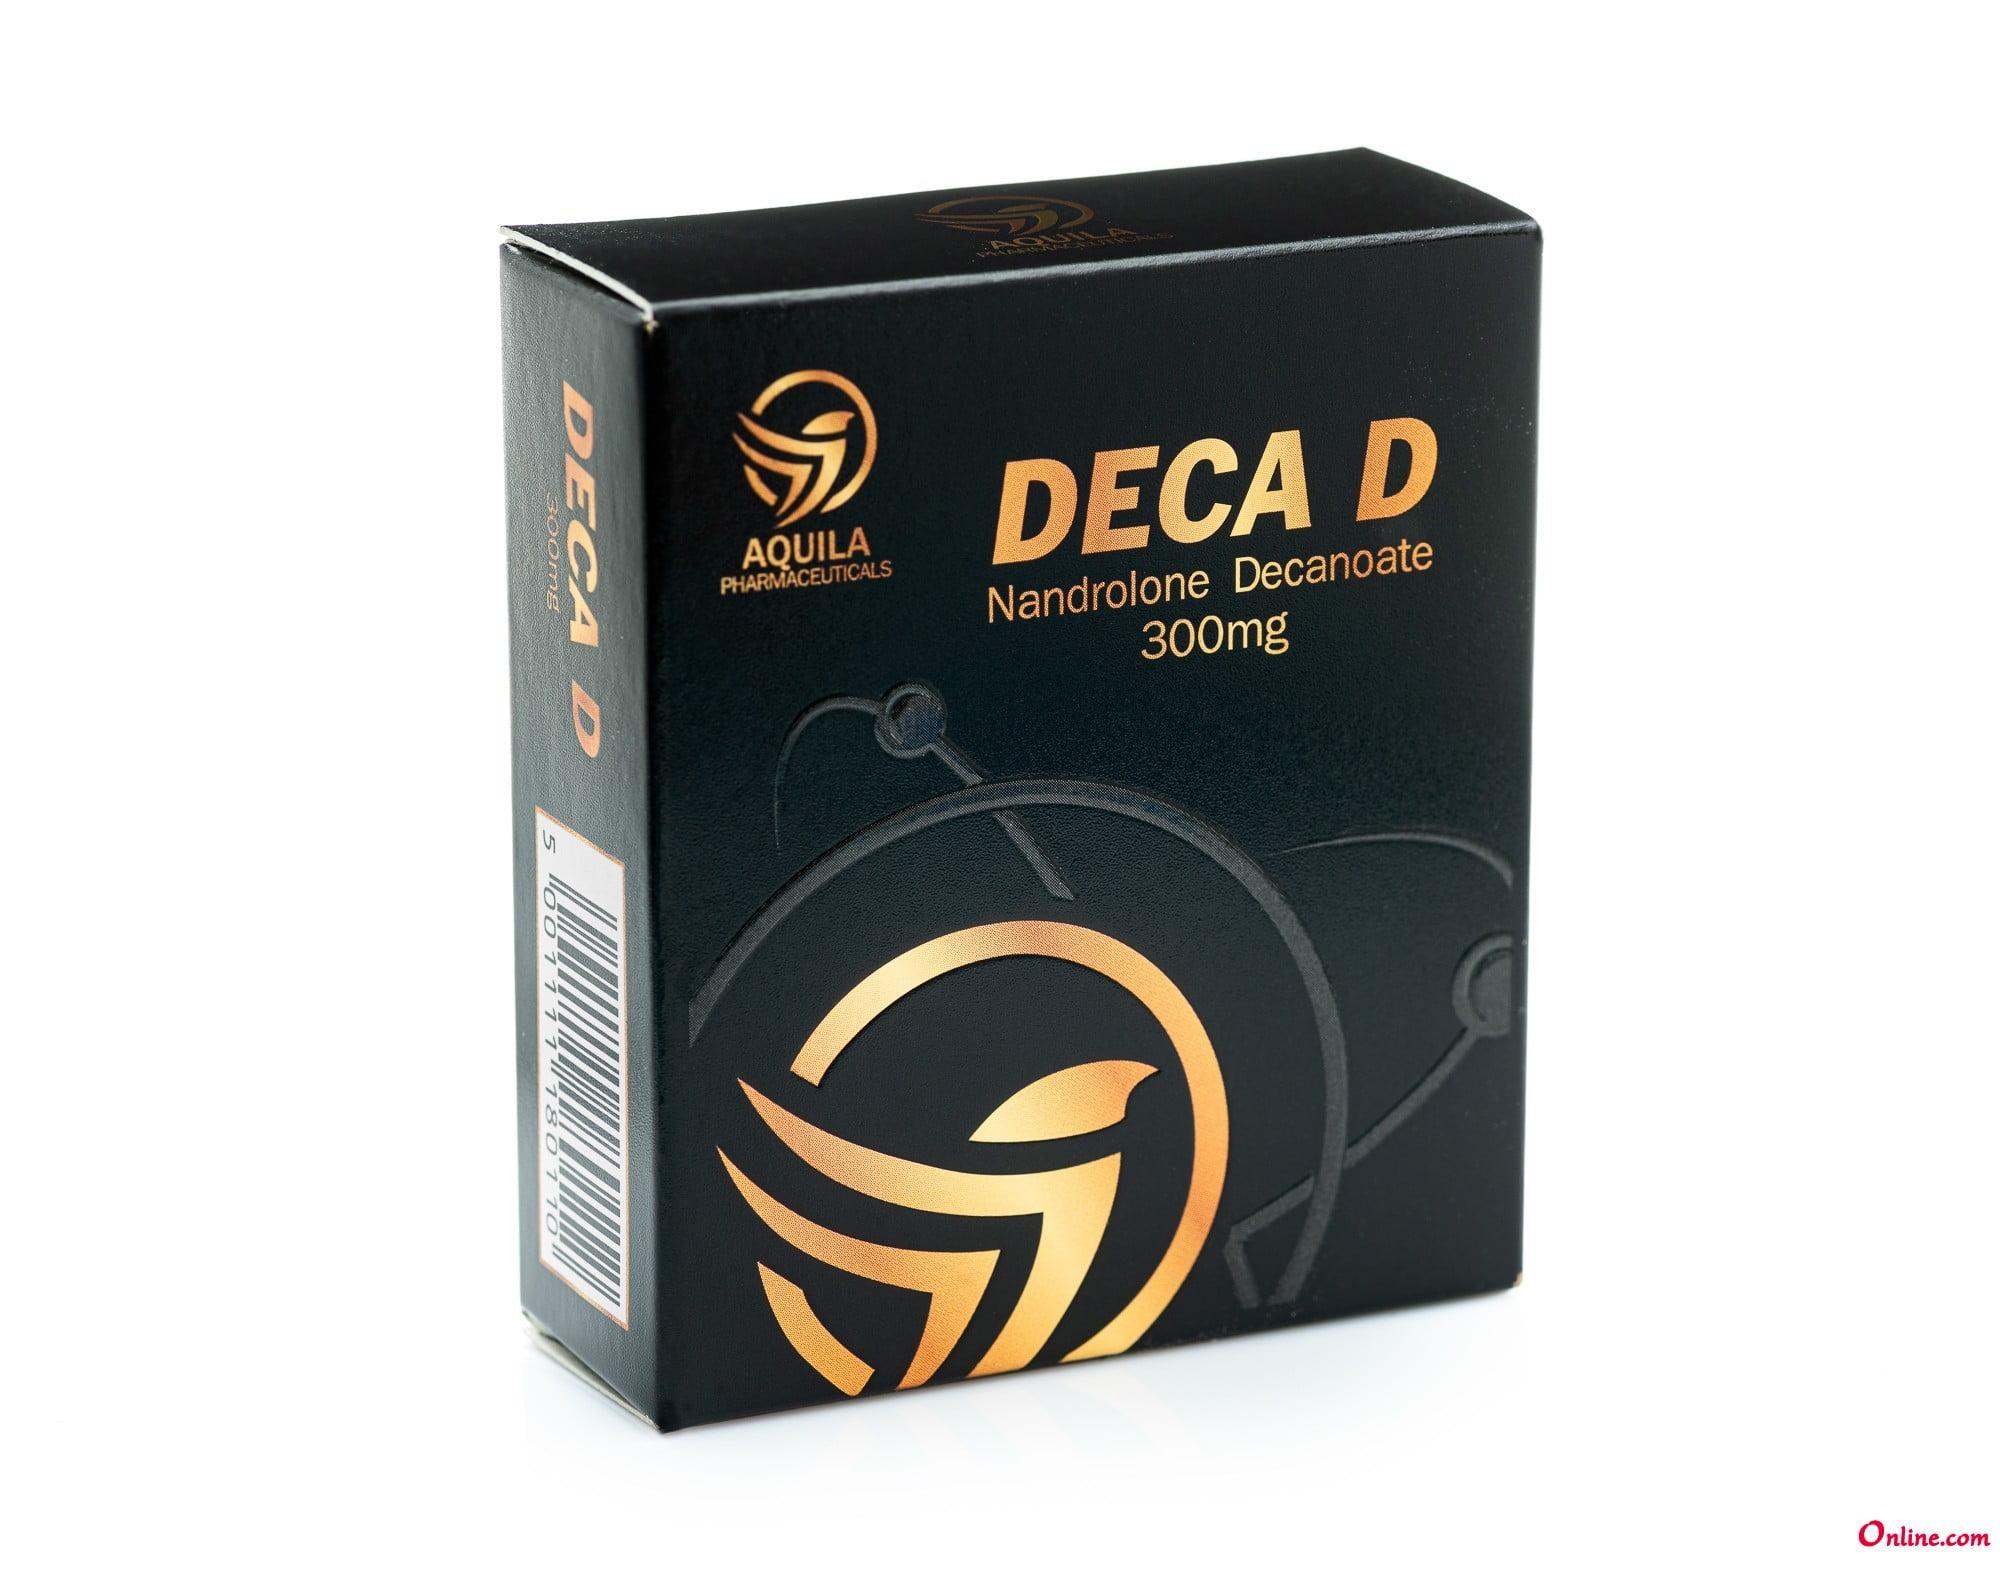 DECA D Nandrolone Decanoate 300 mg